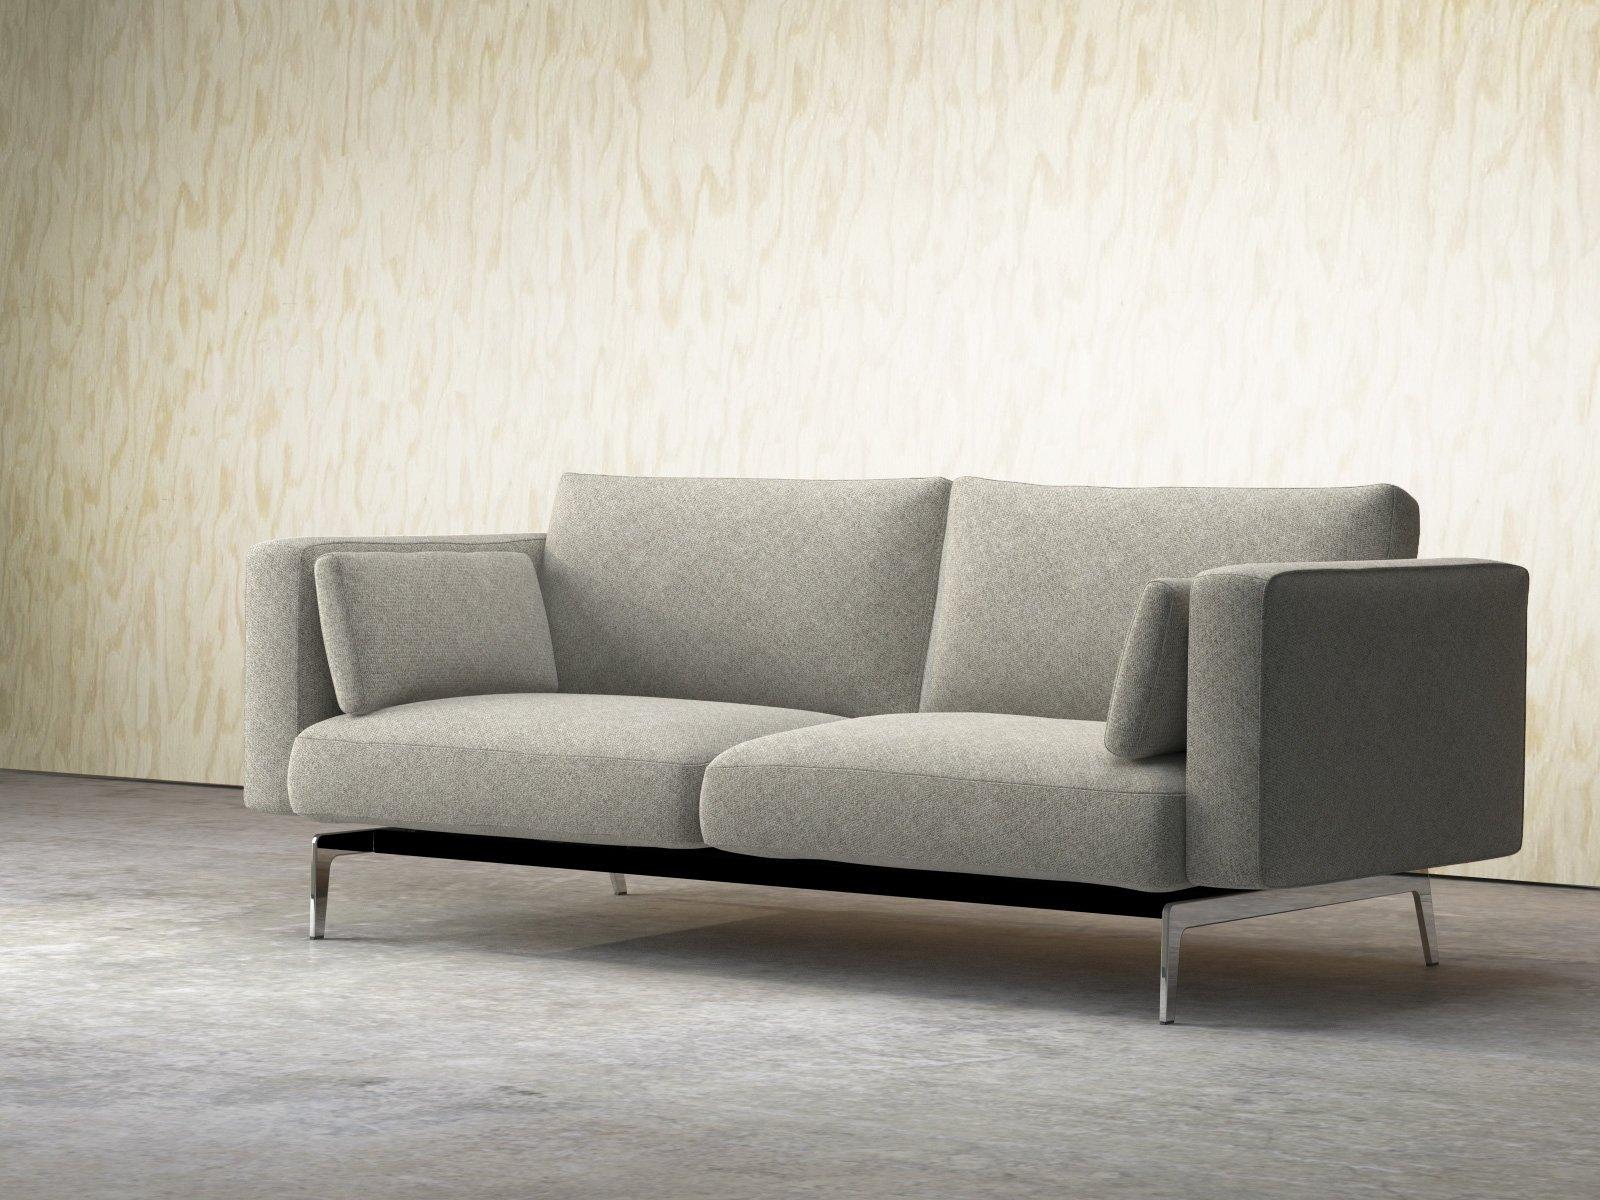 1424 smart 270 modello 3d intertime. Black Bedroom Furniture Sets. Home Design Ideas